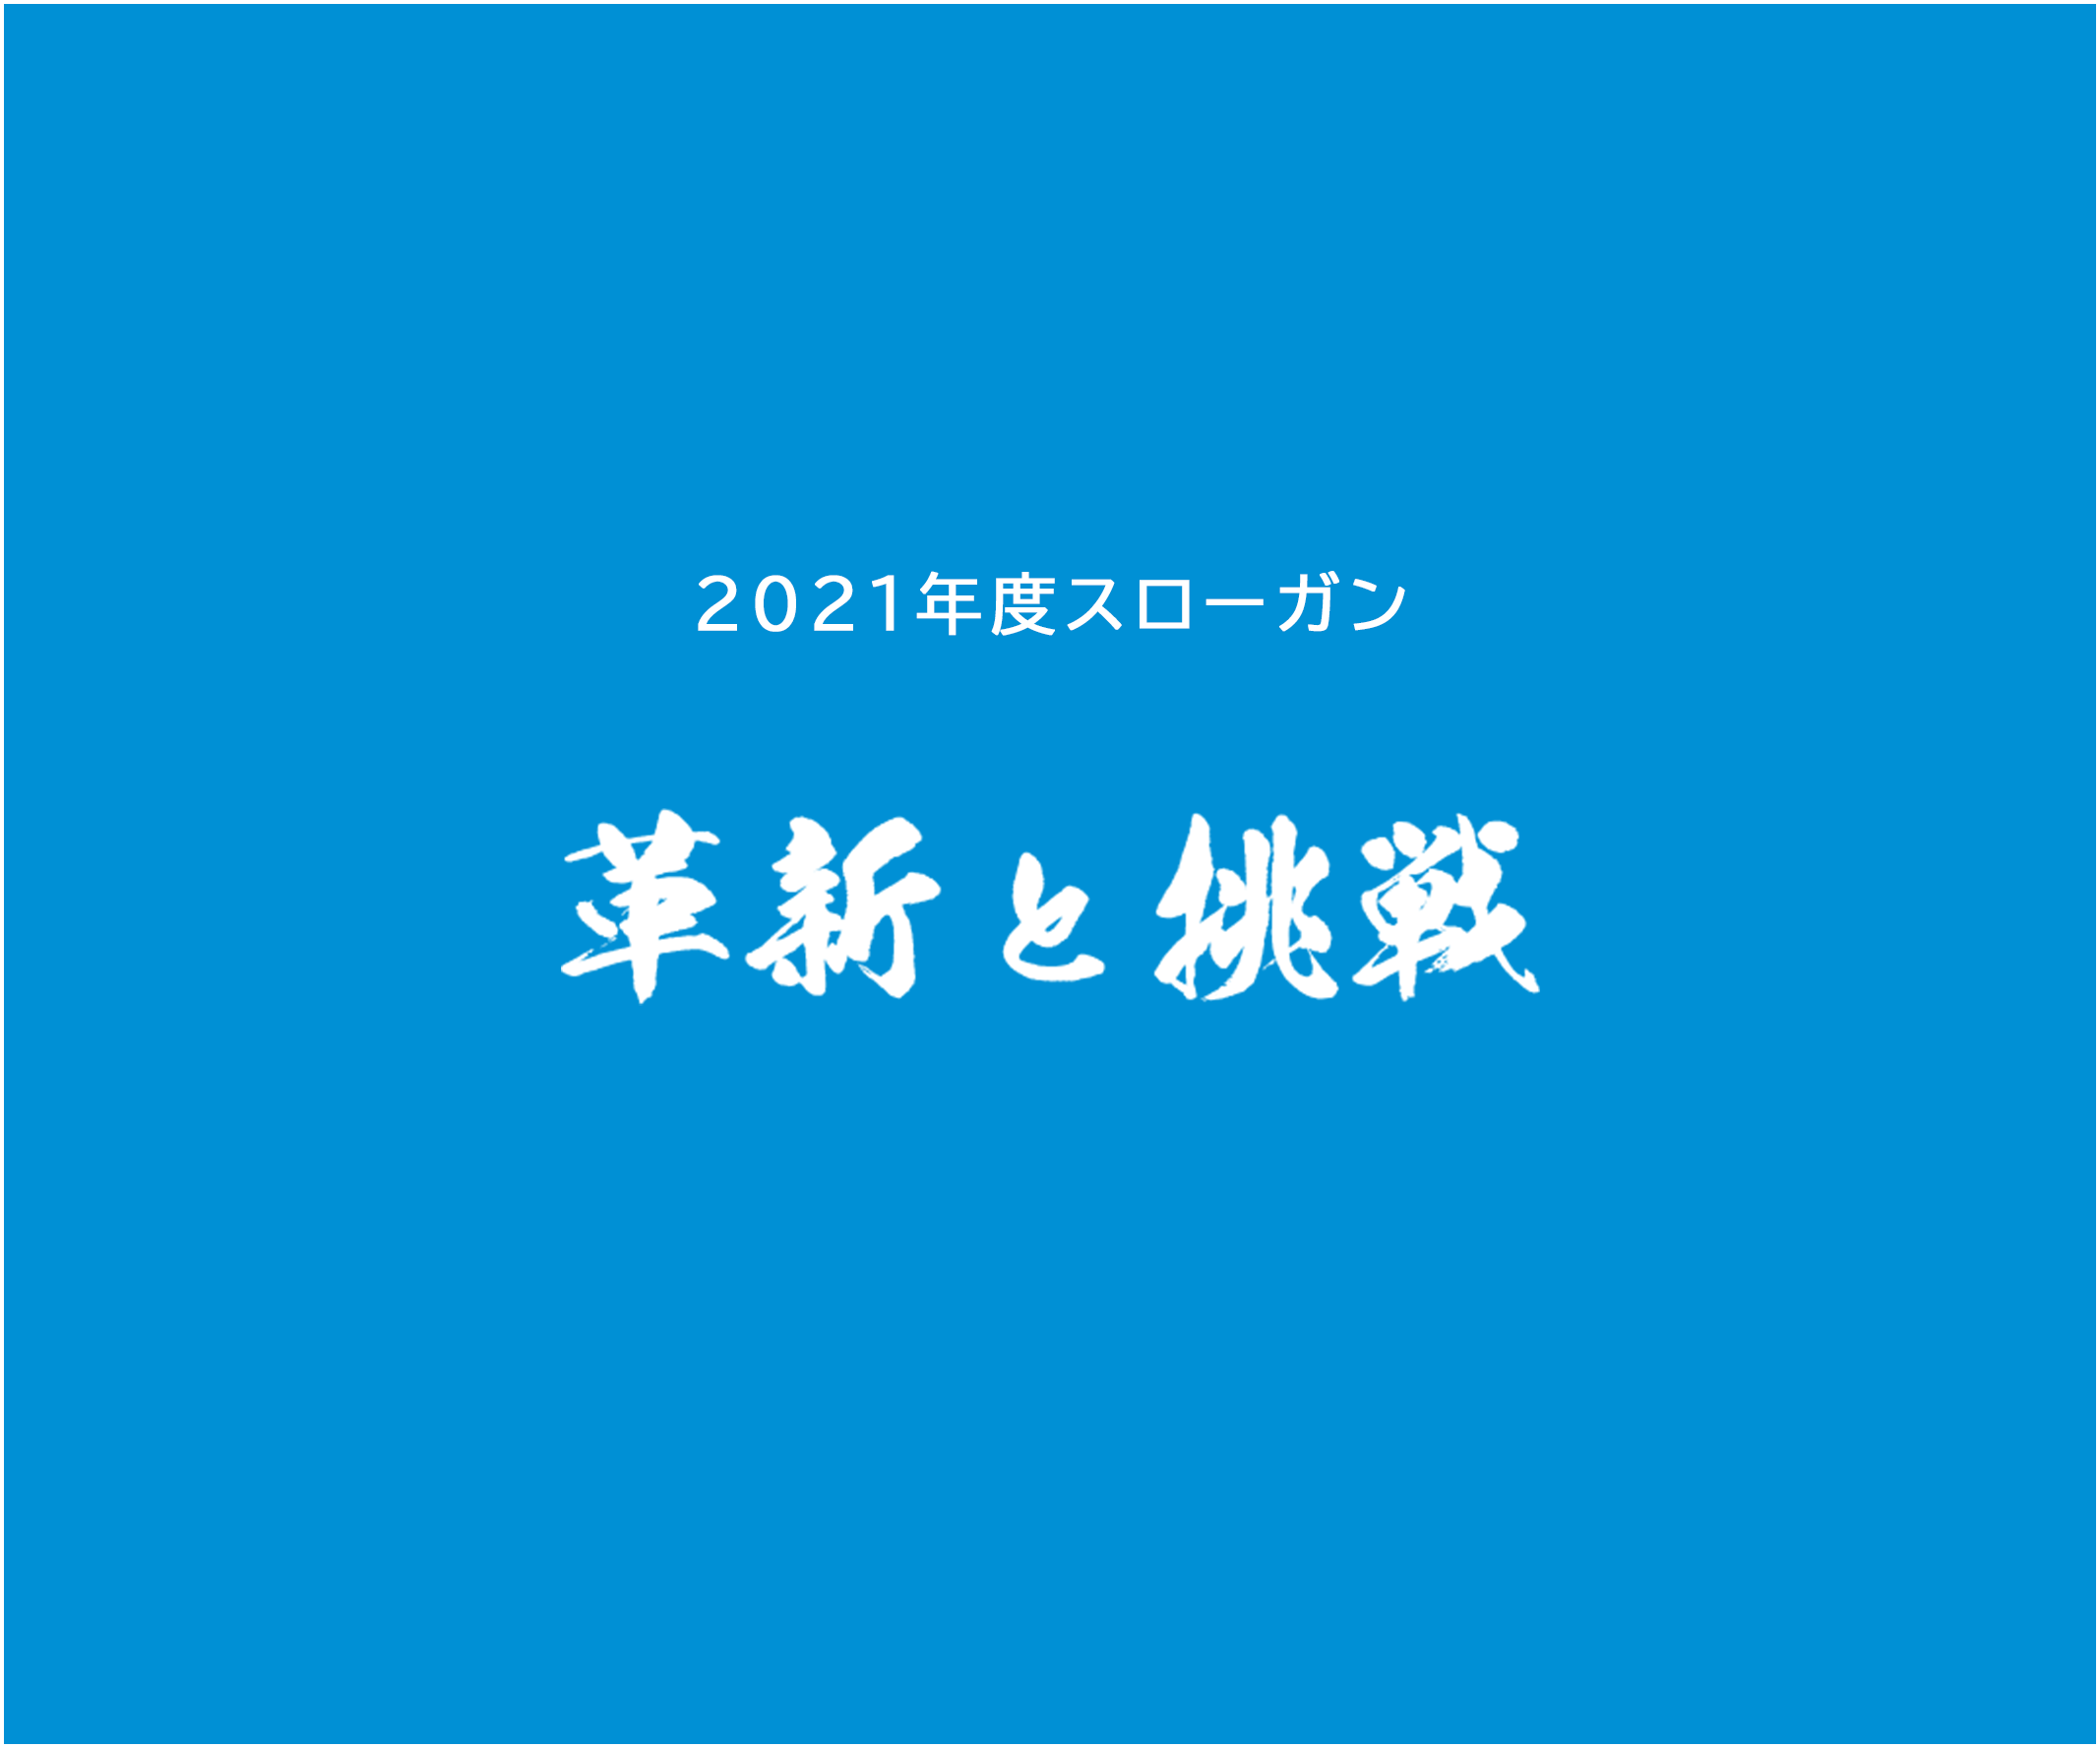 公益社団法人三沢青年会議所 2021年度スローガン